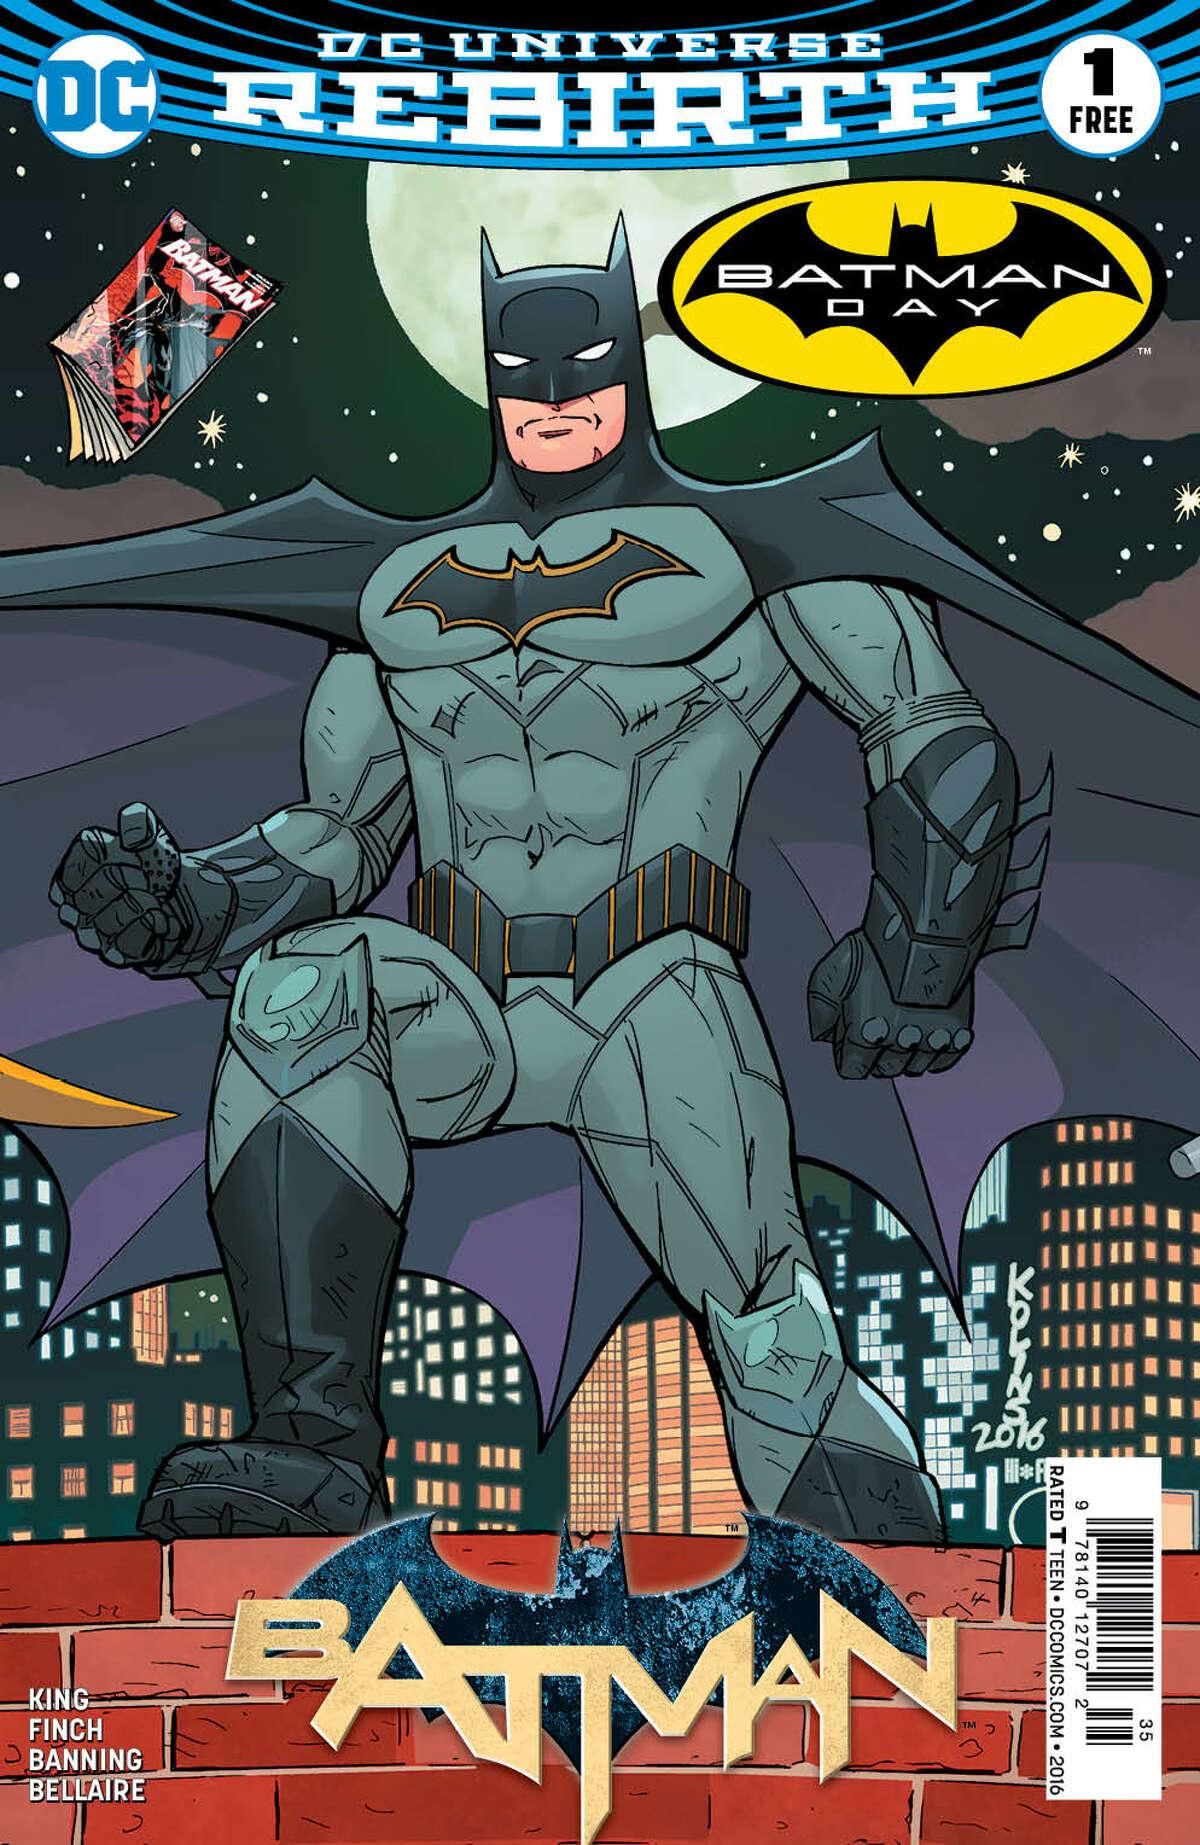 Created by Bob Kane, Batman got his start in the comic books.